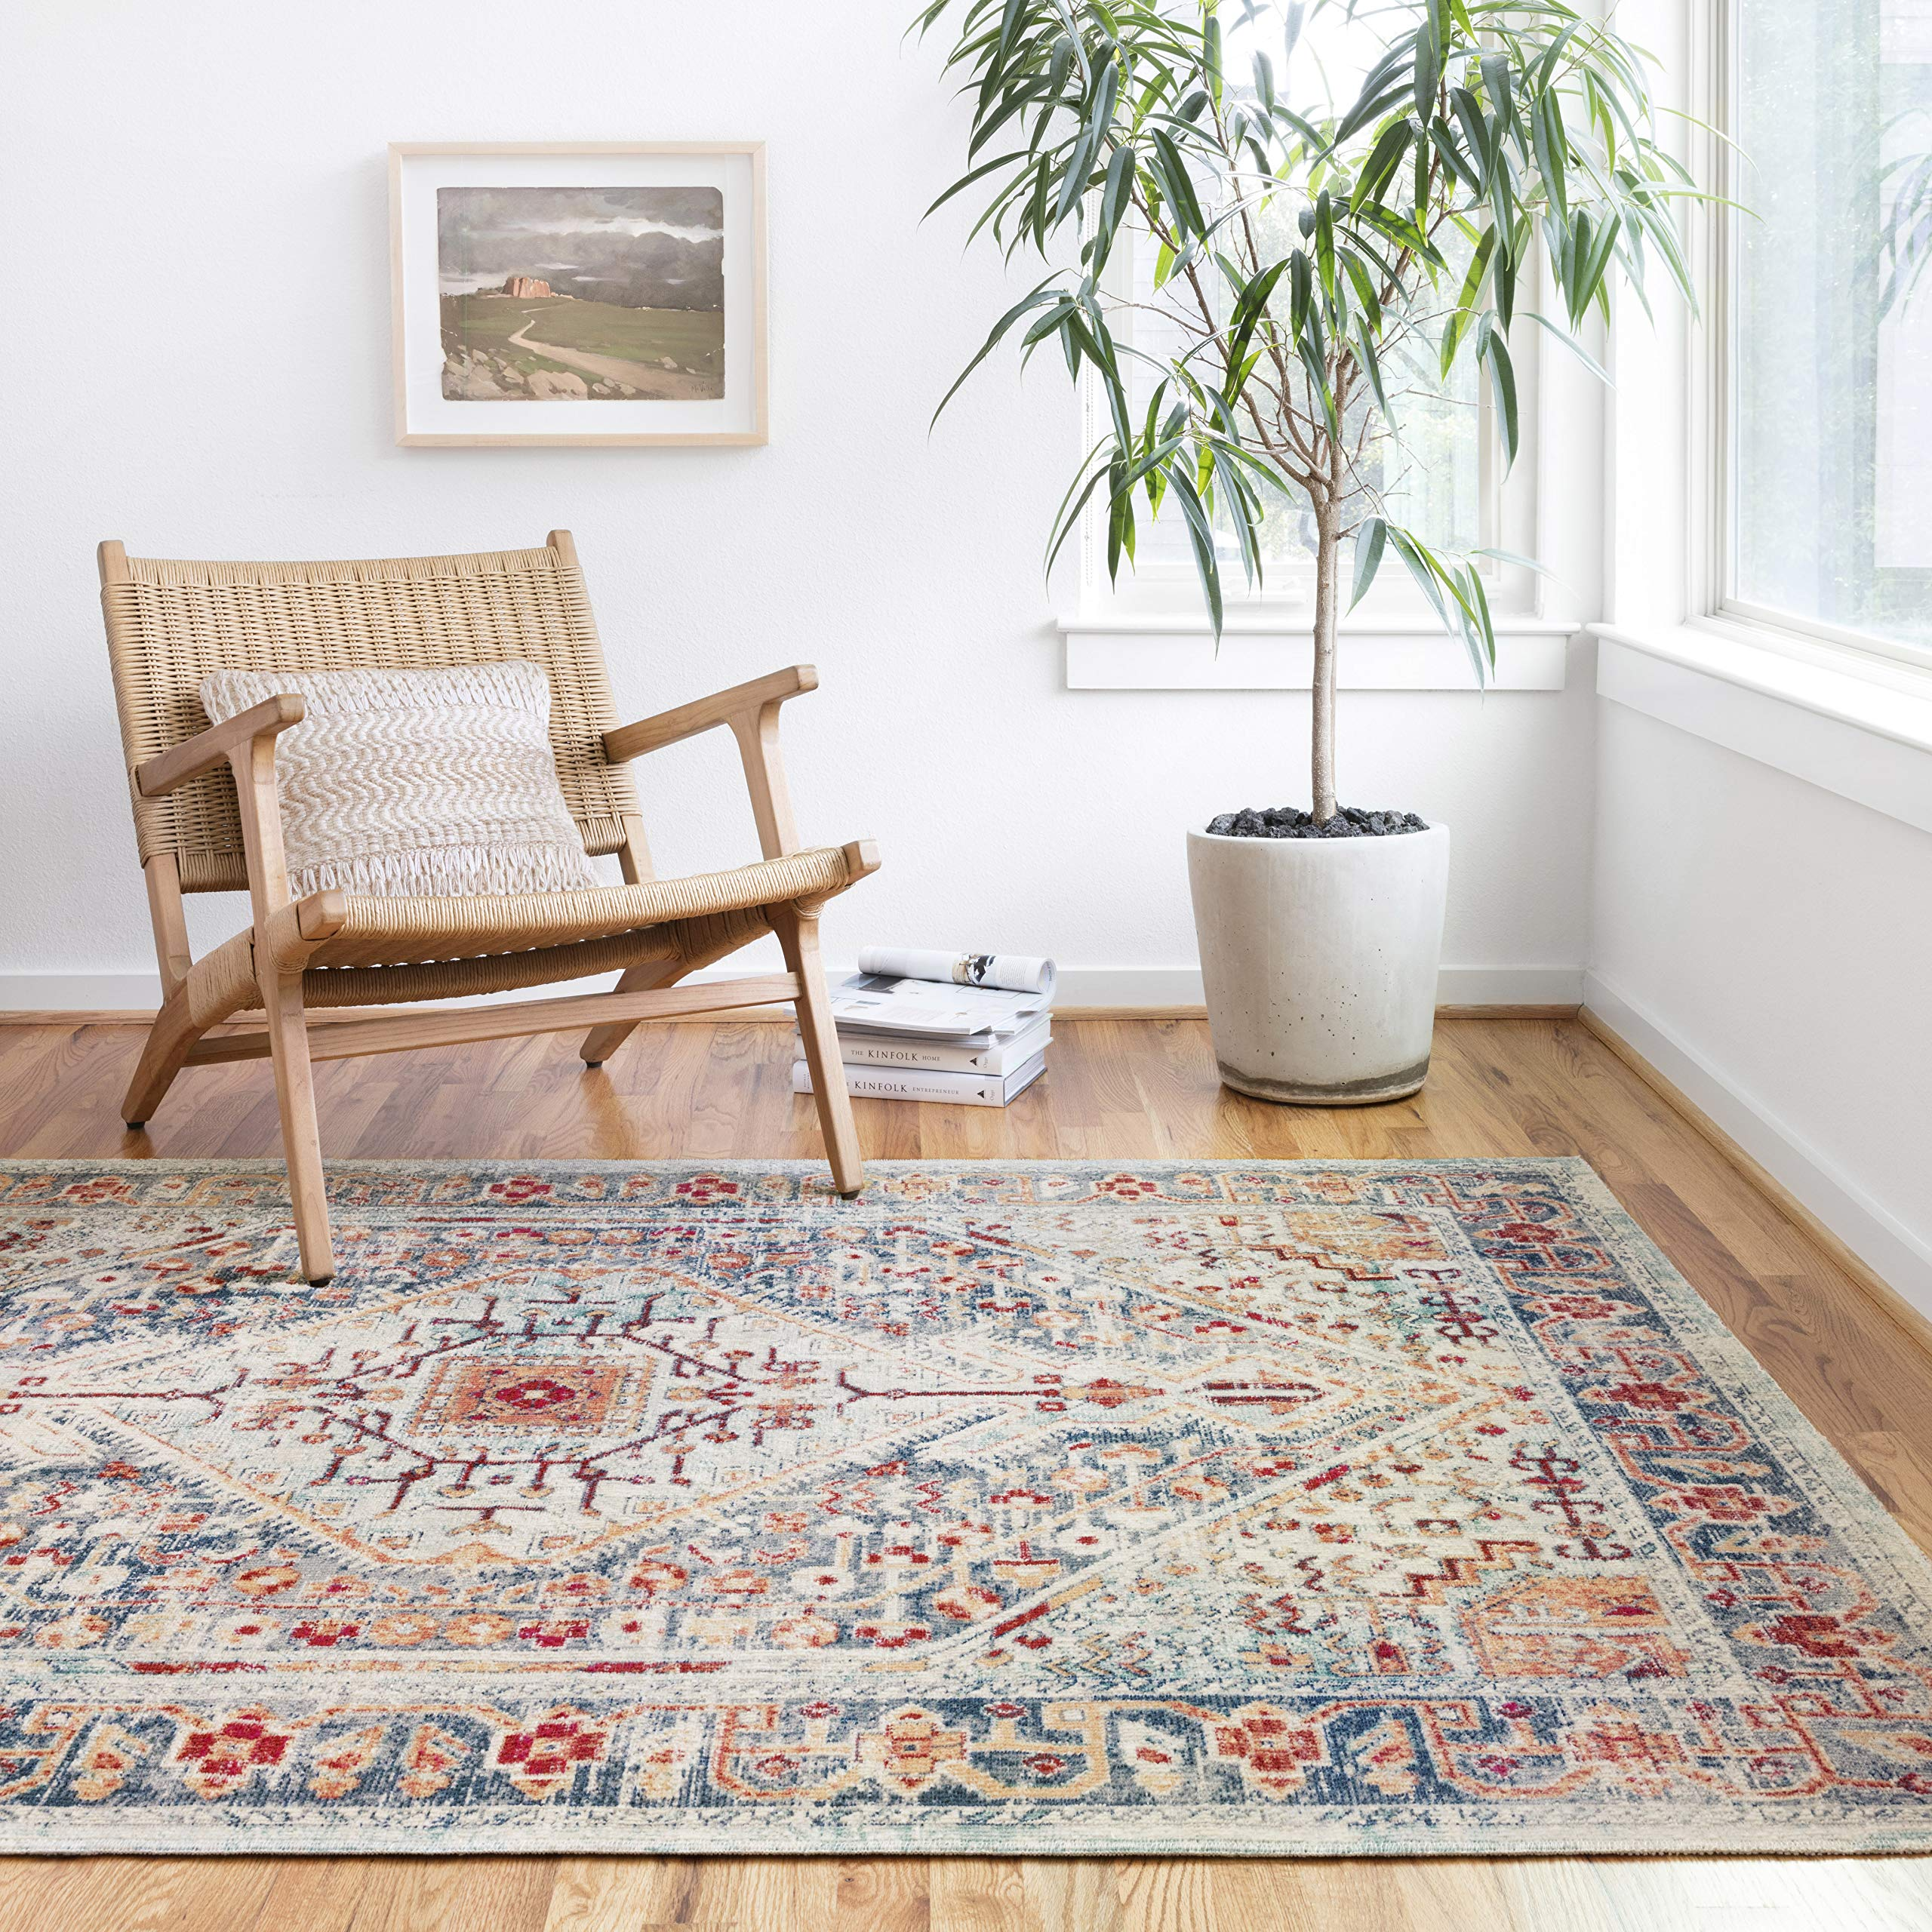 Amazon Com Loloi Ii Nour Collection Distressed Persian Area Rug 7 9 X 10 6 Blue Fiesta Furniture Decor